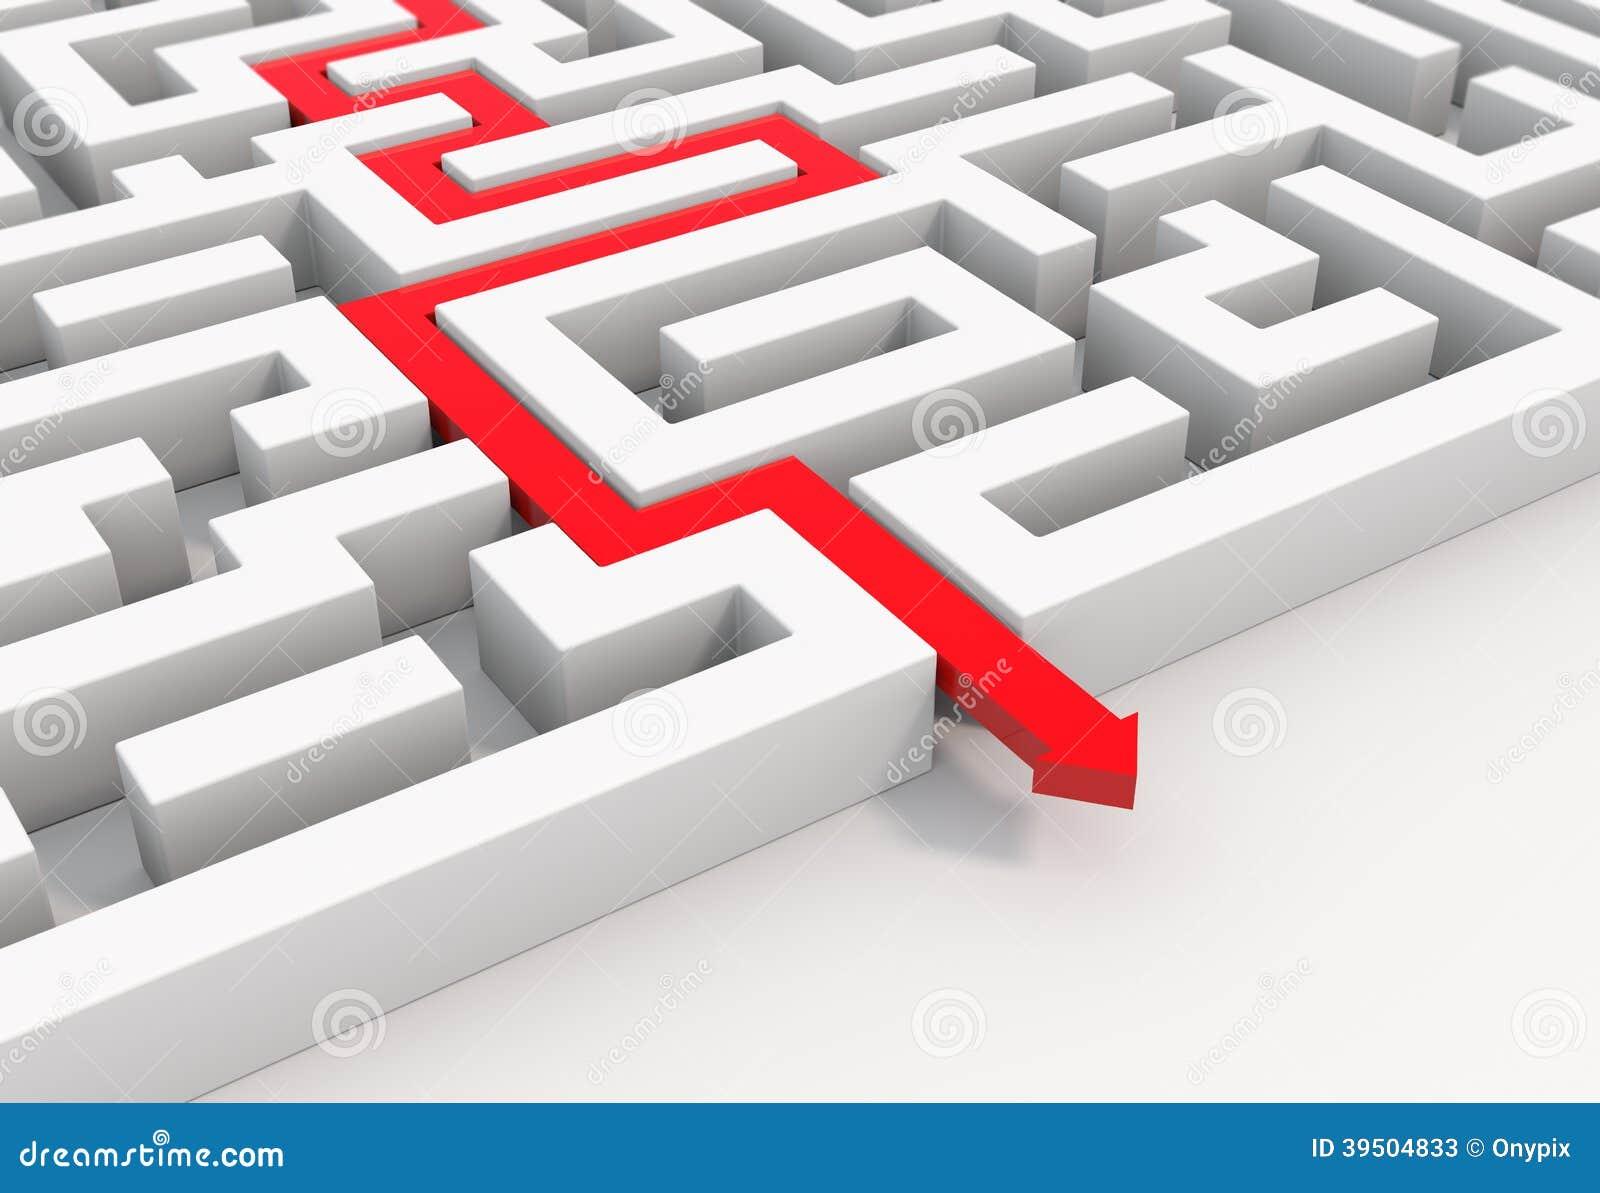 Red arrow leads through a maze